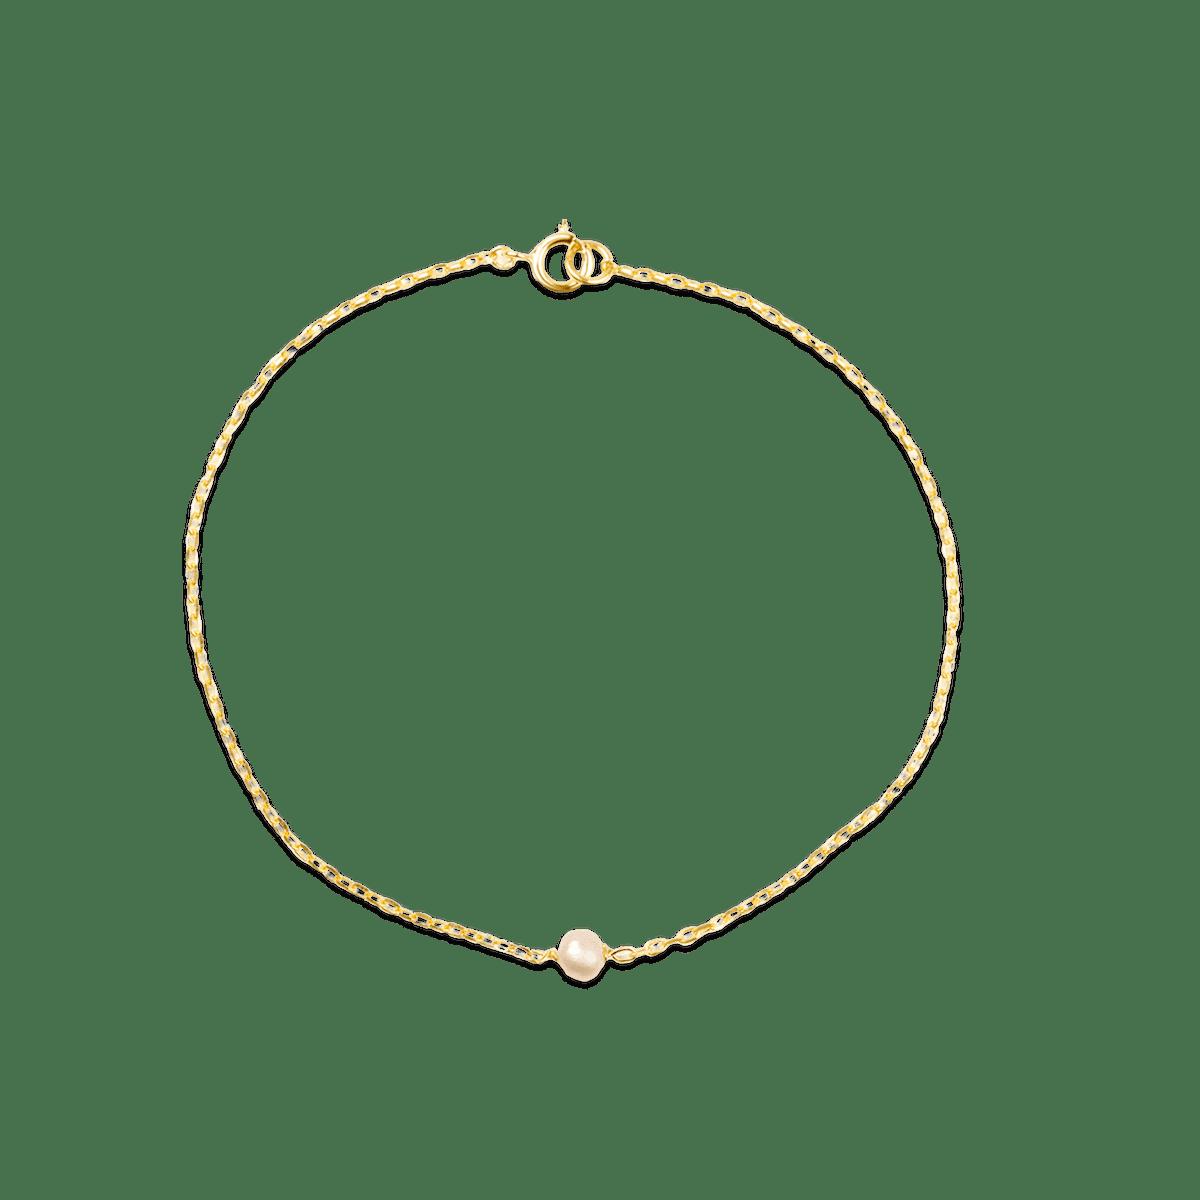 Tiny Solitaire Pearl Bracelet